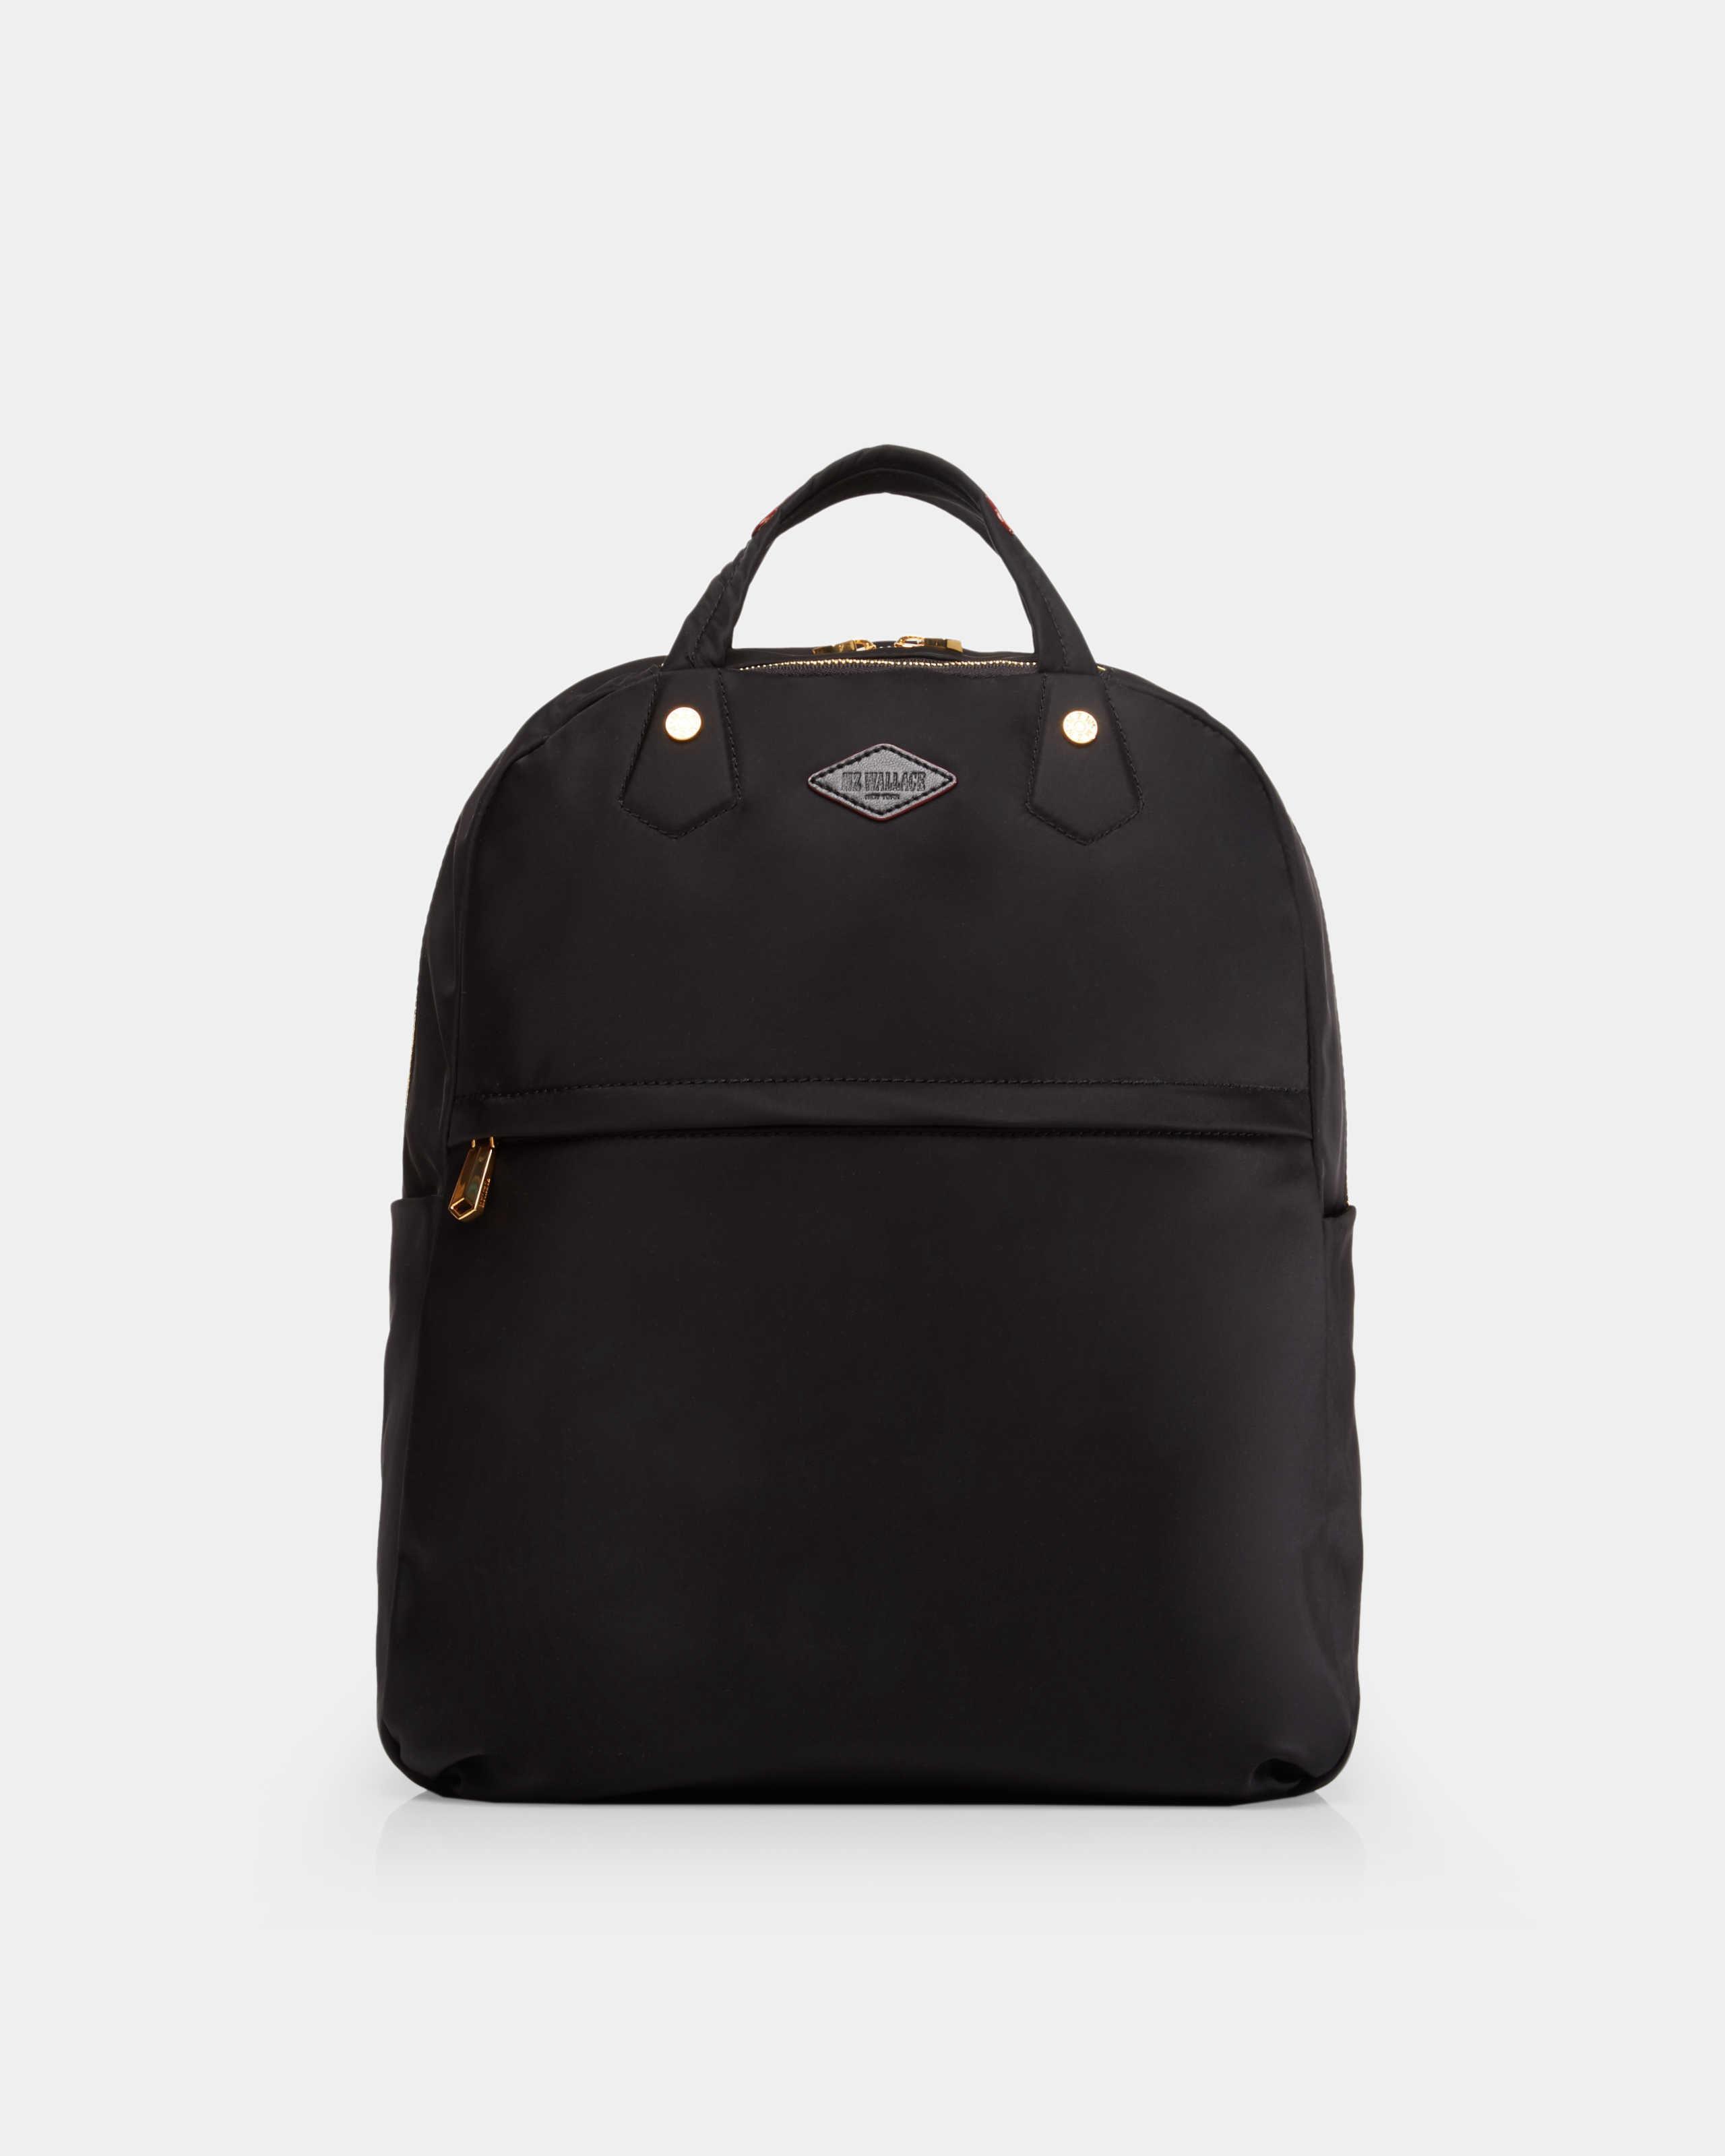 588c5b734ff8 MZ Wallace Soho Nylon Backpack in Black - Save 8% - Lyst